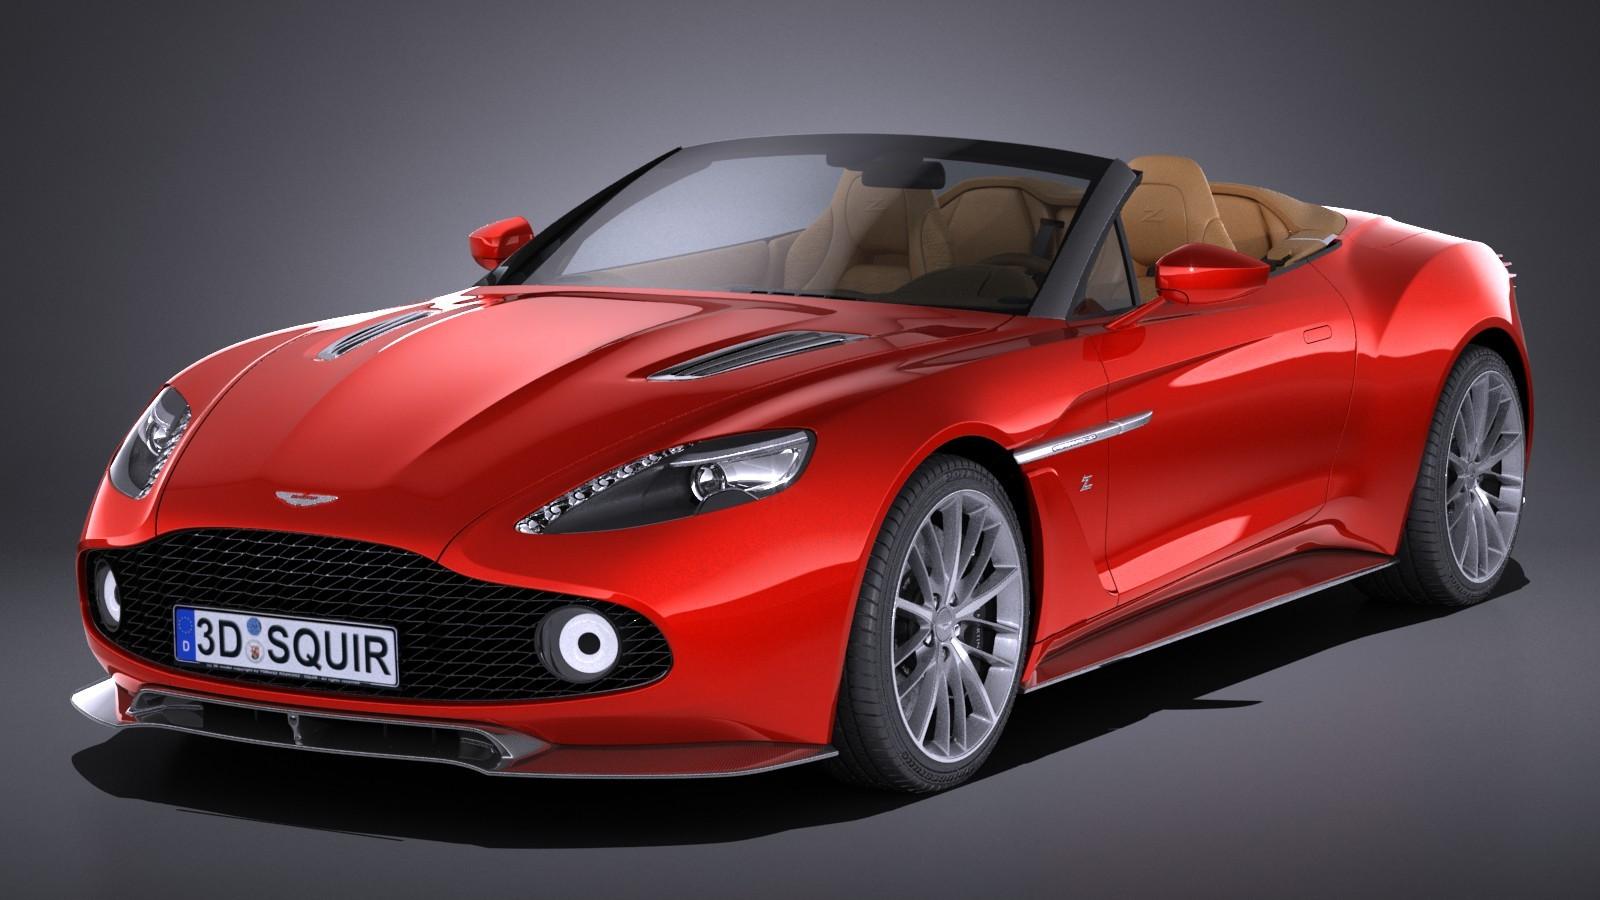 Vanquish Zagato For Sale >> Aston Martin Vanquish Zagato Volante 2017 Convertible Car Vehicles 3D Models